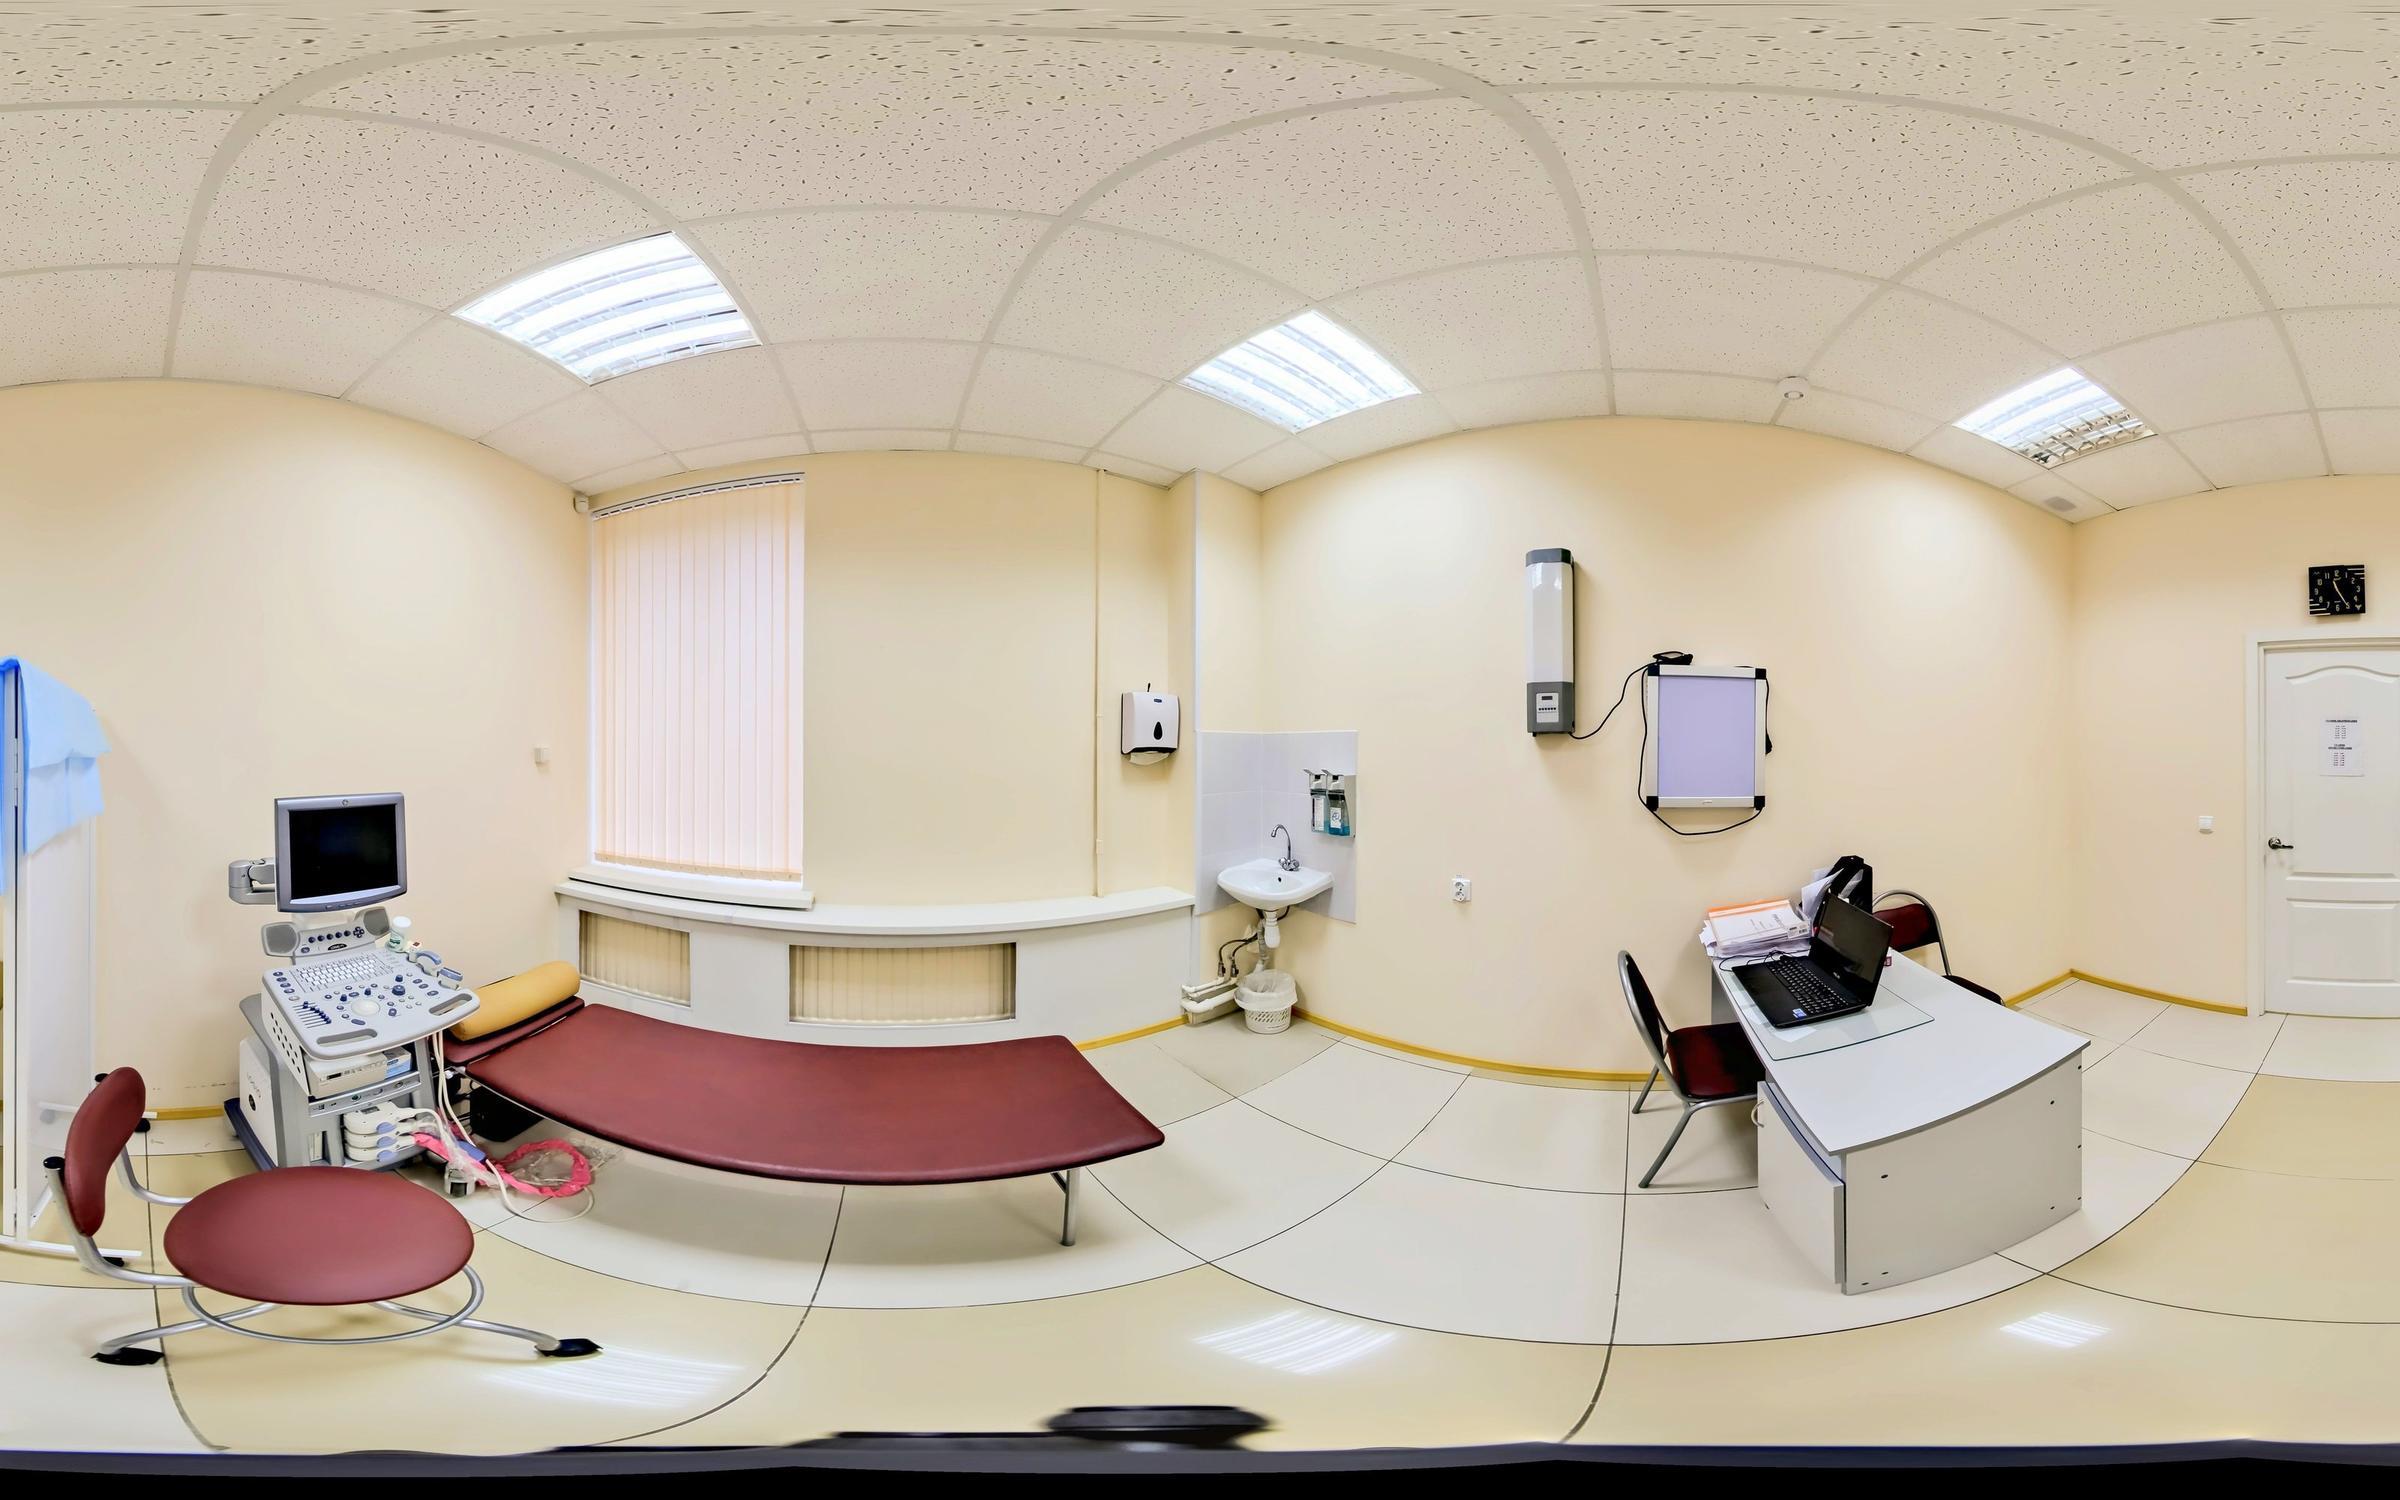 фотография Клиники Гранти-мед, центр амбулаторной хирургии на улице Чекистов